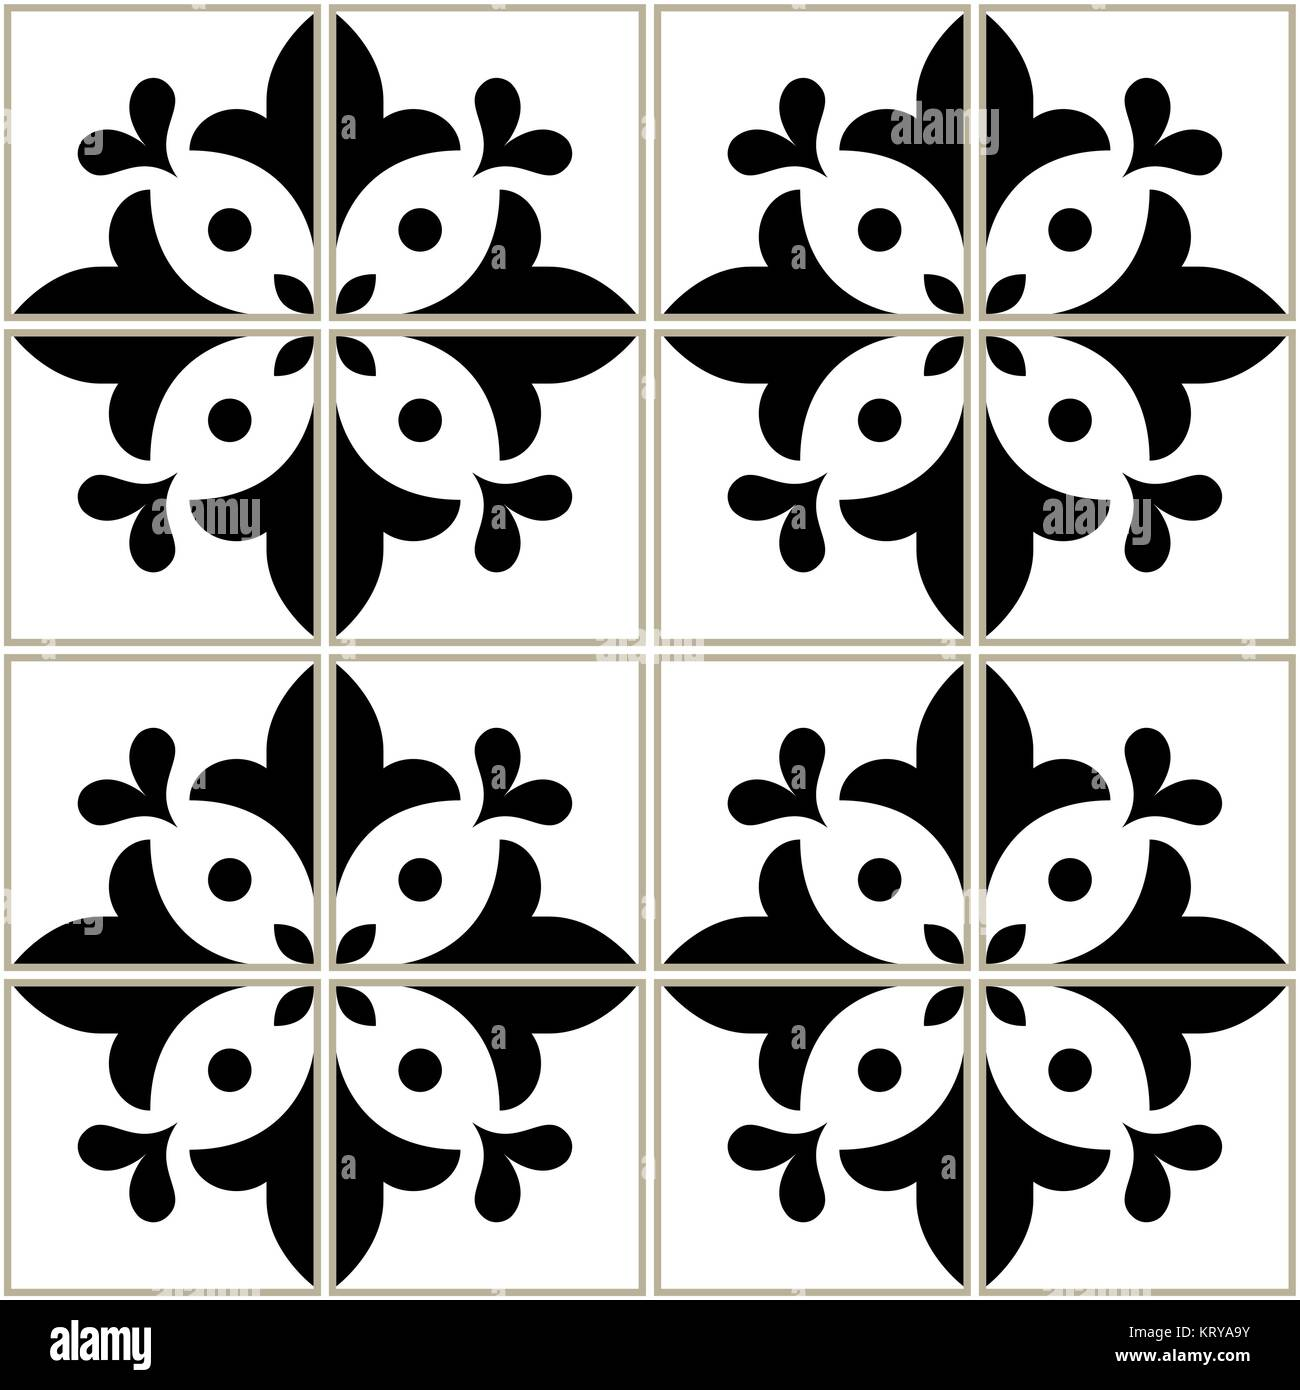 Azulejos azulejos portugueses patr n azul marino dise o for Azulejo a cuadros blanco y negro barato